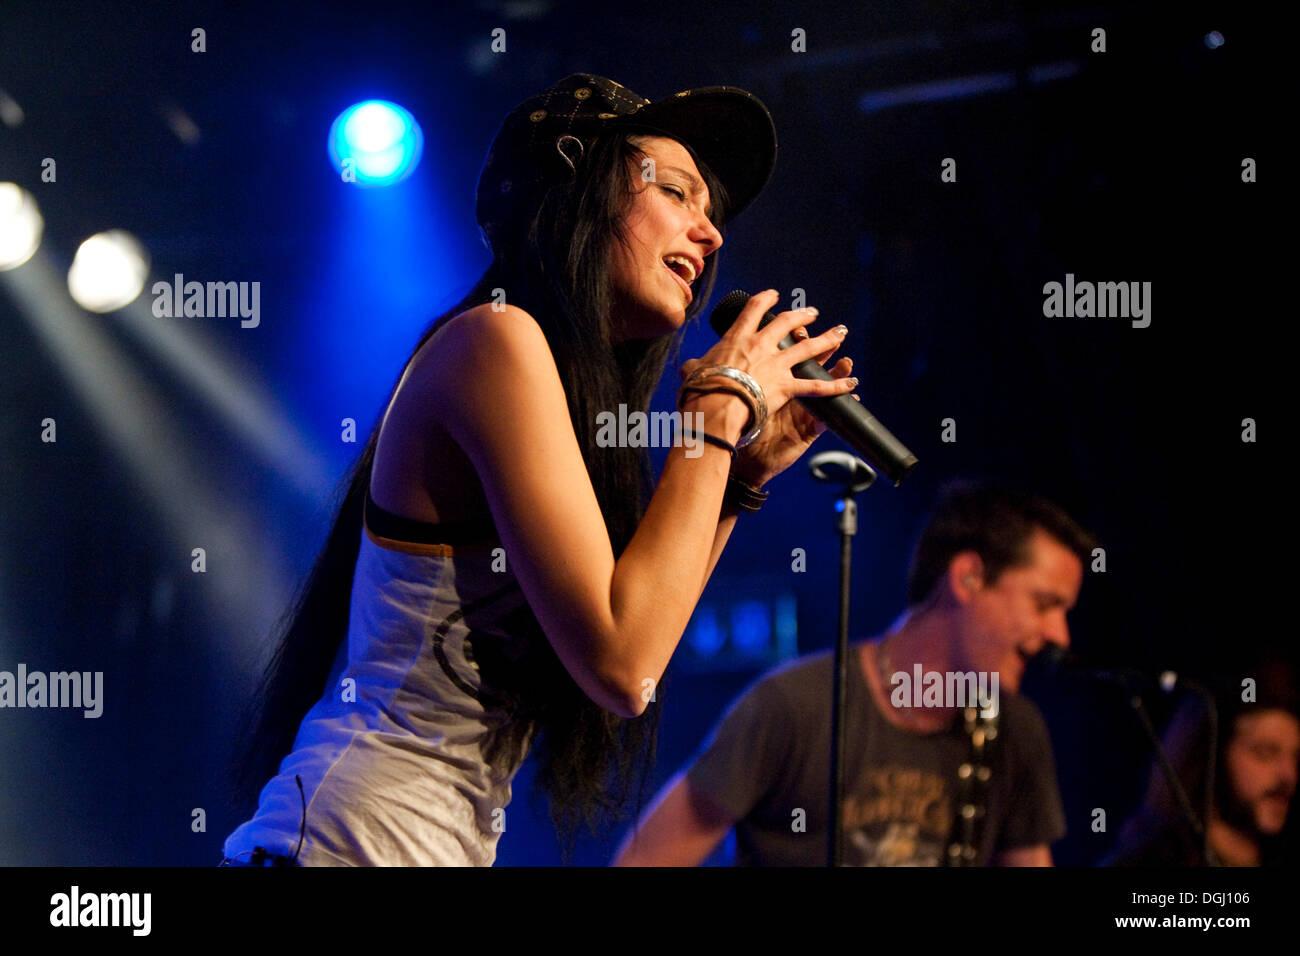 The Swiss singer Bernadette Hoehn aka Boerni live at the Schueuer venue, Lucerne, Switzerland Stock Photo